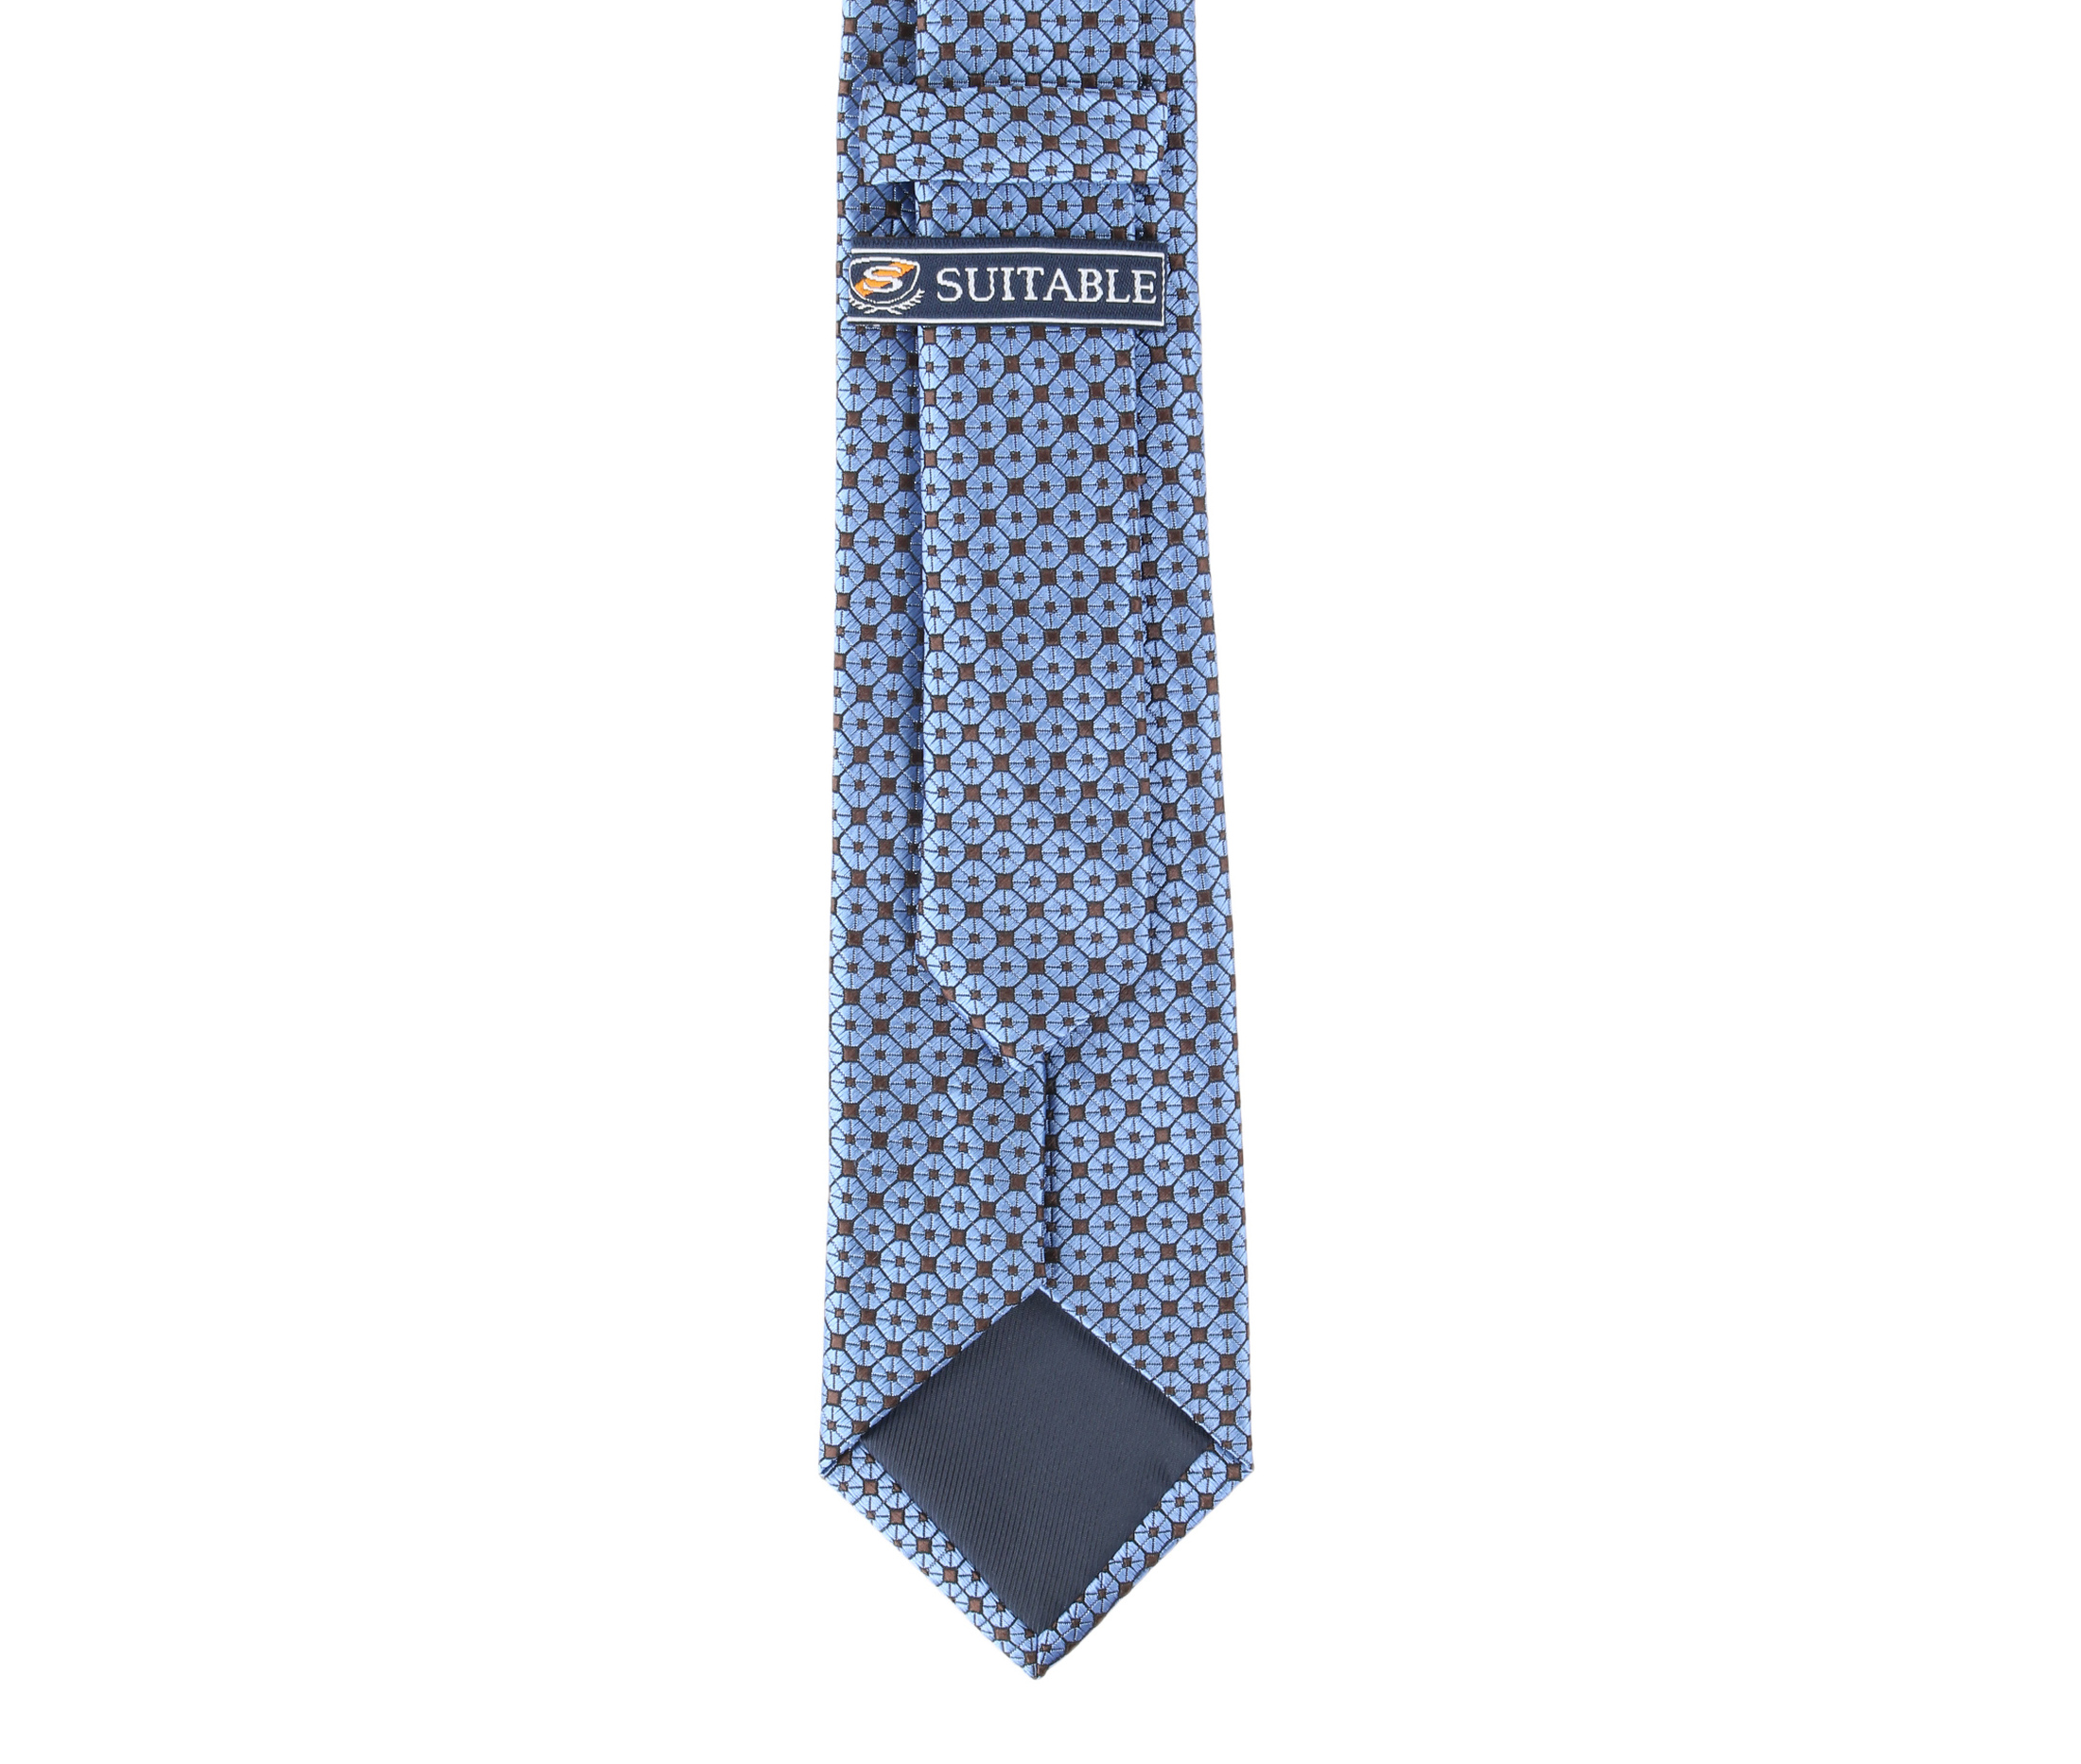 Krawatte Seide Dessin Blau 9-17 foto 3